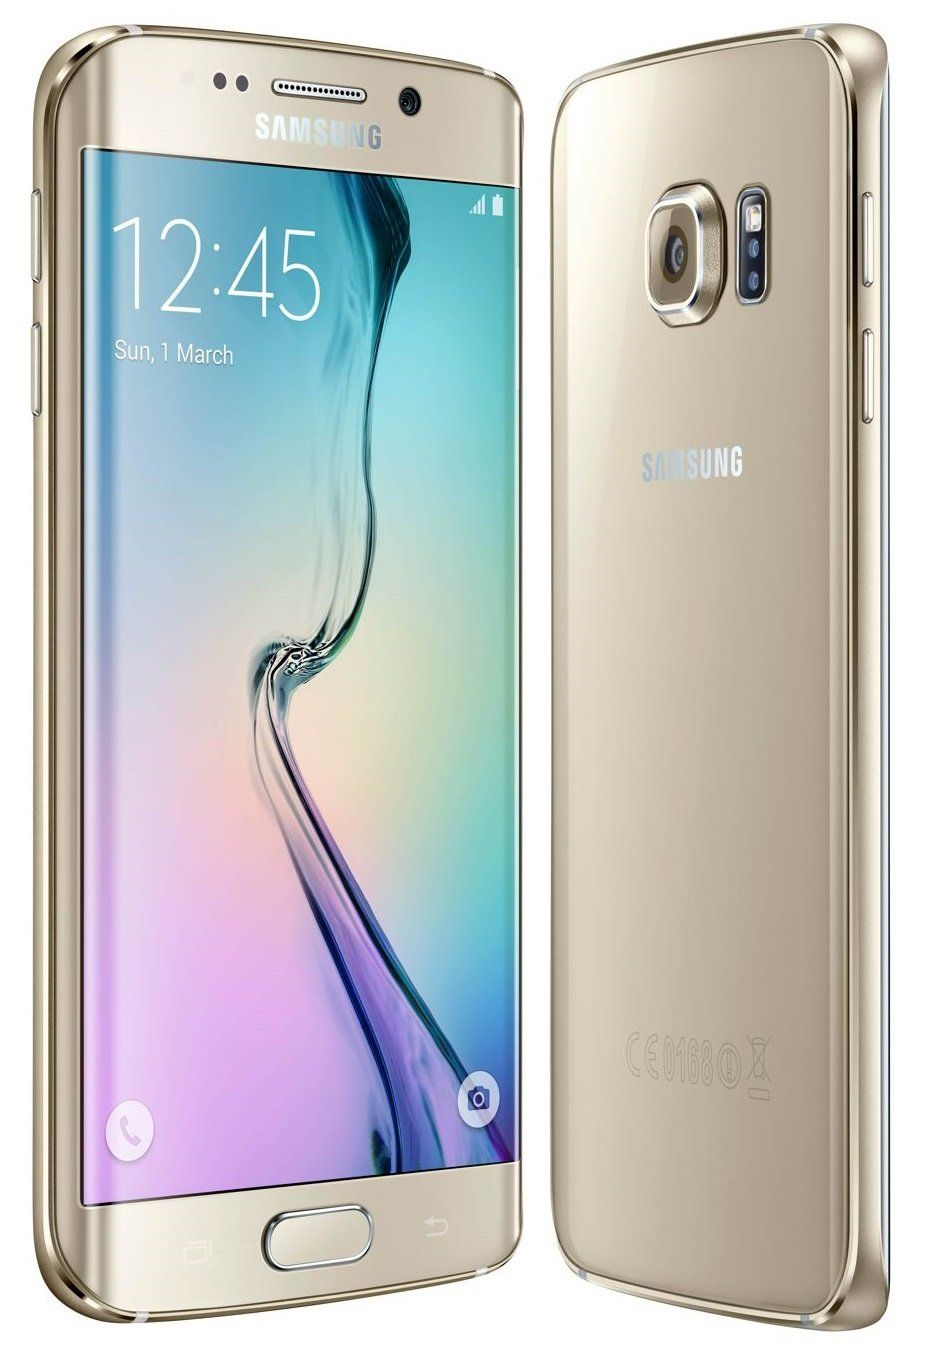 Samsung Galaxy S6 Edge Unlocked Gold Best Deals On Smart Phones And Accessories Samsung Galaxy S6 Edge Samsung Galaxy Samsung Galaxy S6